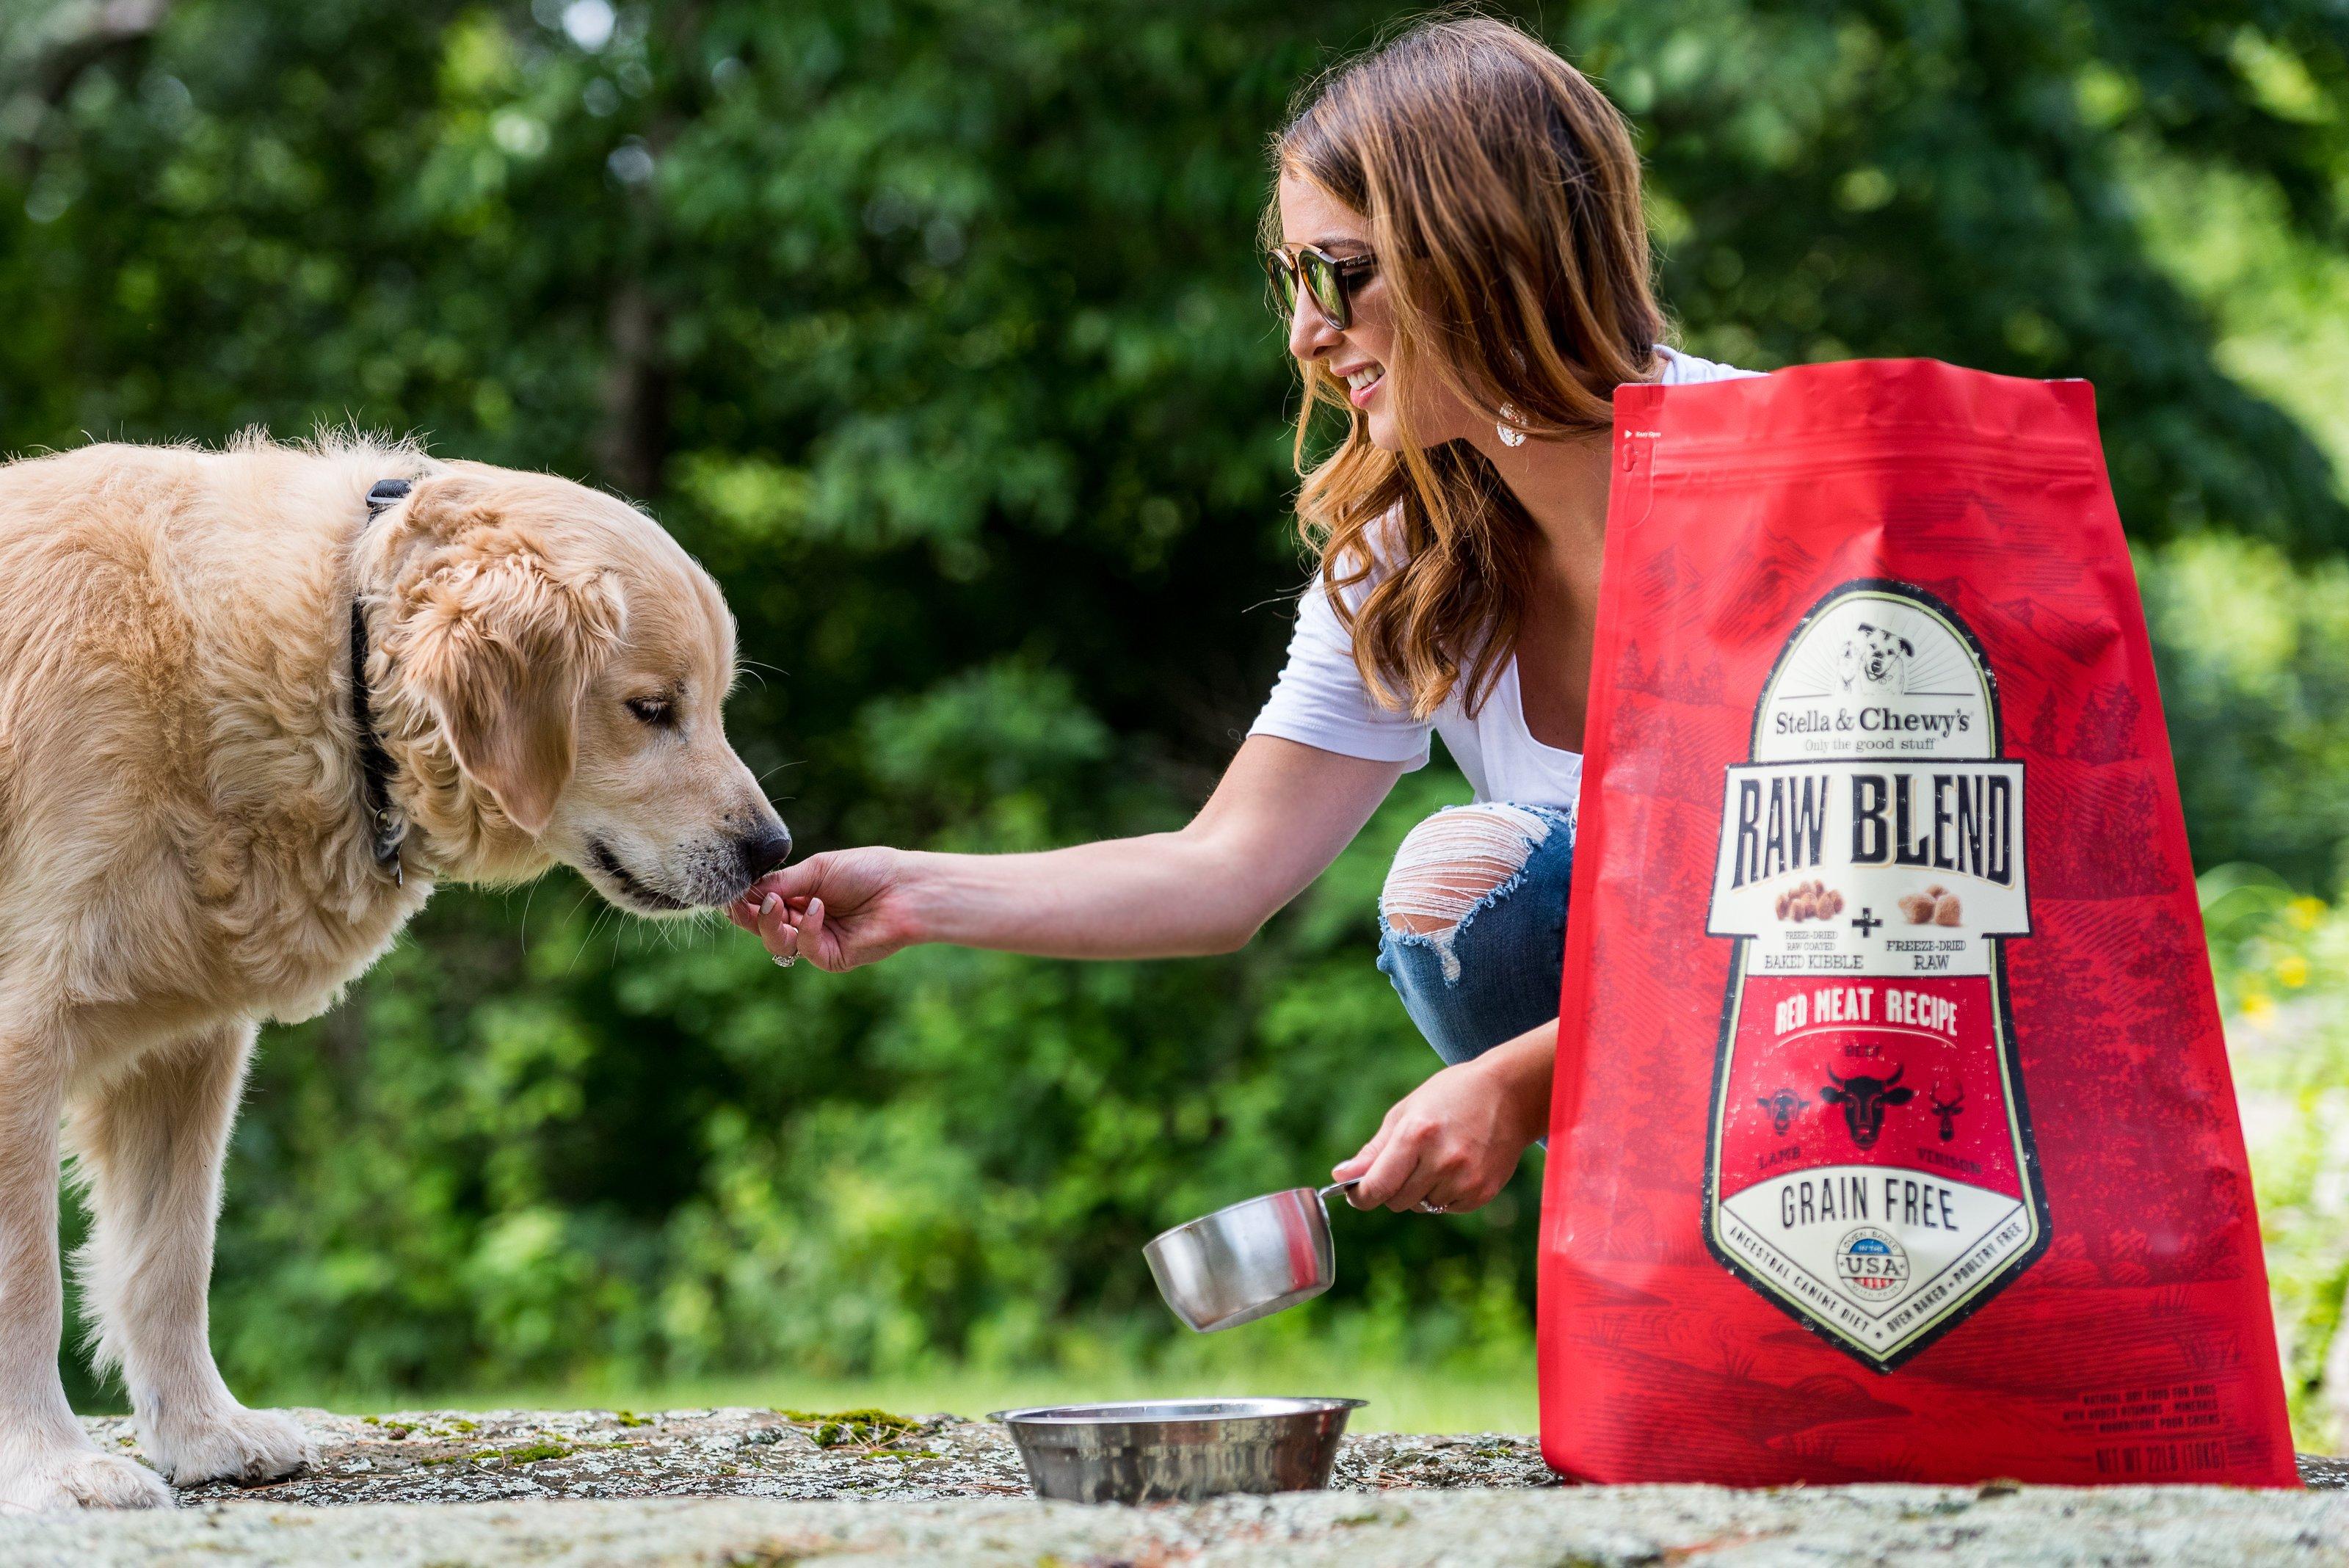 Jax for Stella & Chewy's: Getting a Dog 101